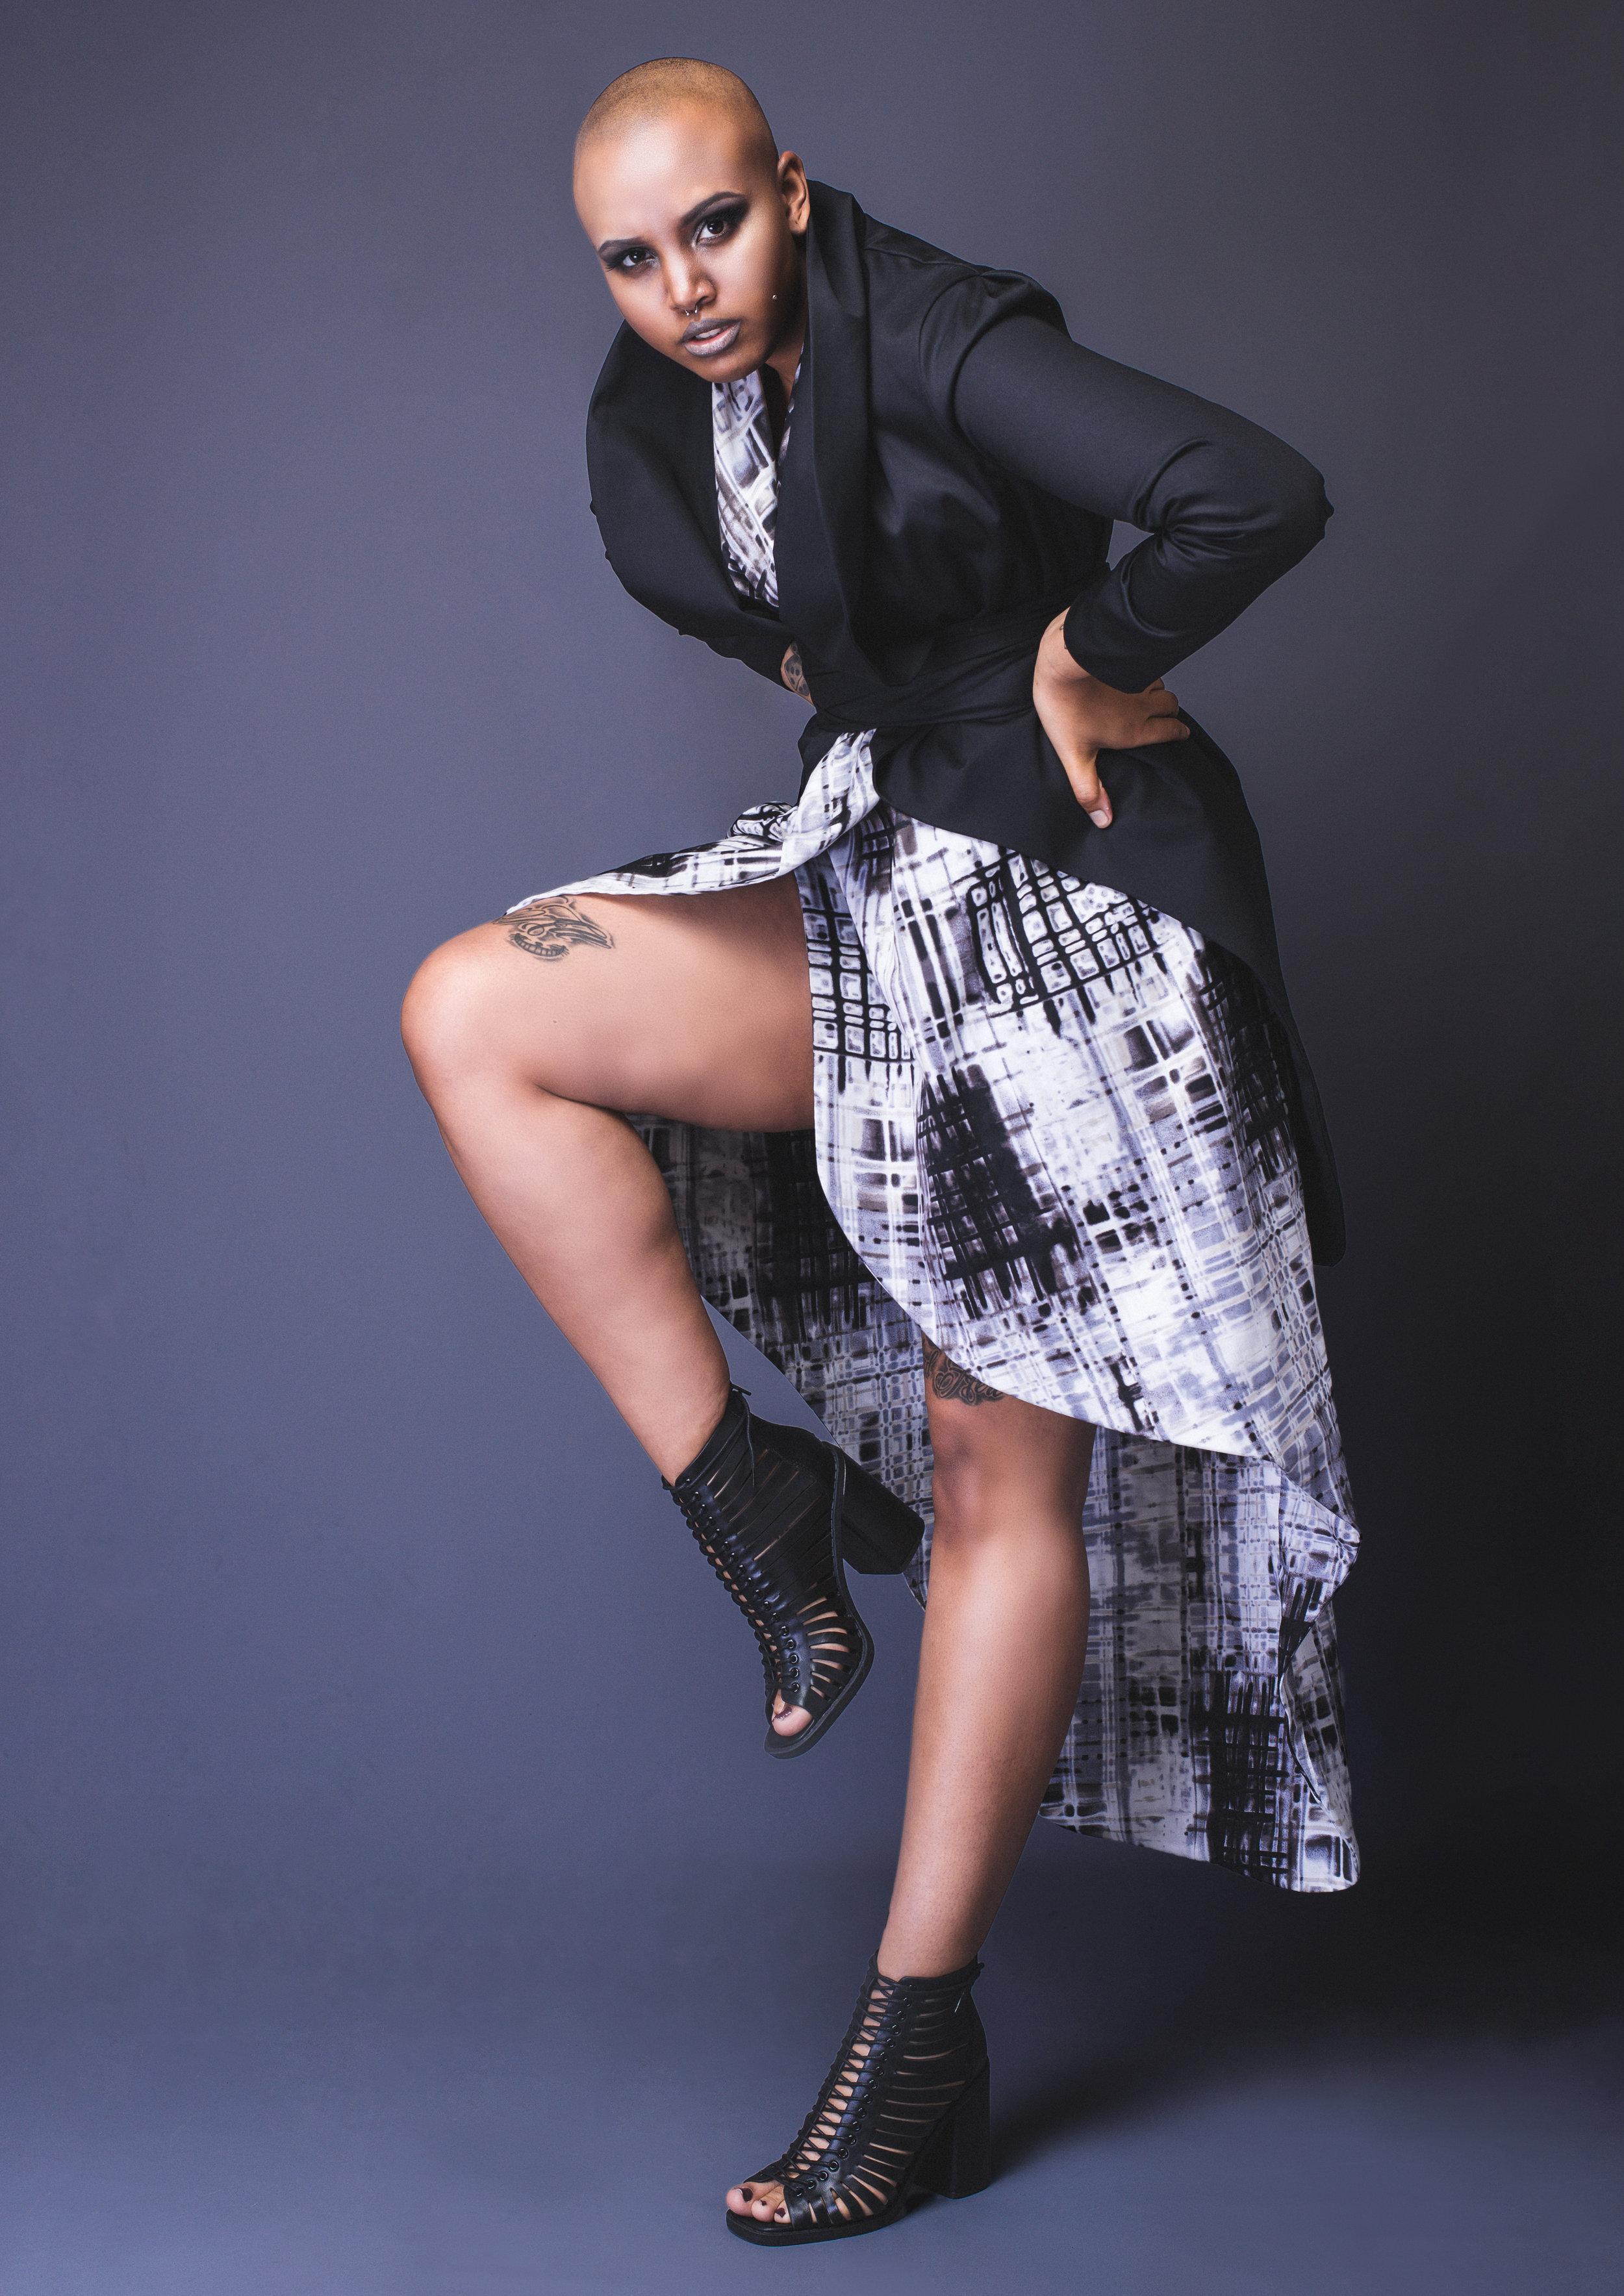 zaramia-ava-zaramiaava-leeds-fashion-designer-leedsfashiondesigner-stylist-leeds-stylist-leedsstylist-ethical-sustainable-minimalist-versatile-drape-wrap-grey-cowl-soro-dress-yuo-jacket-7